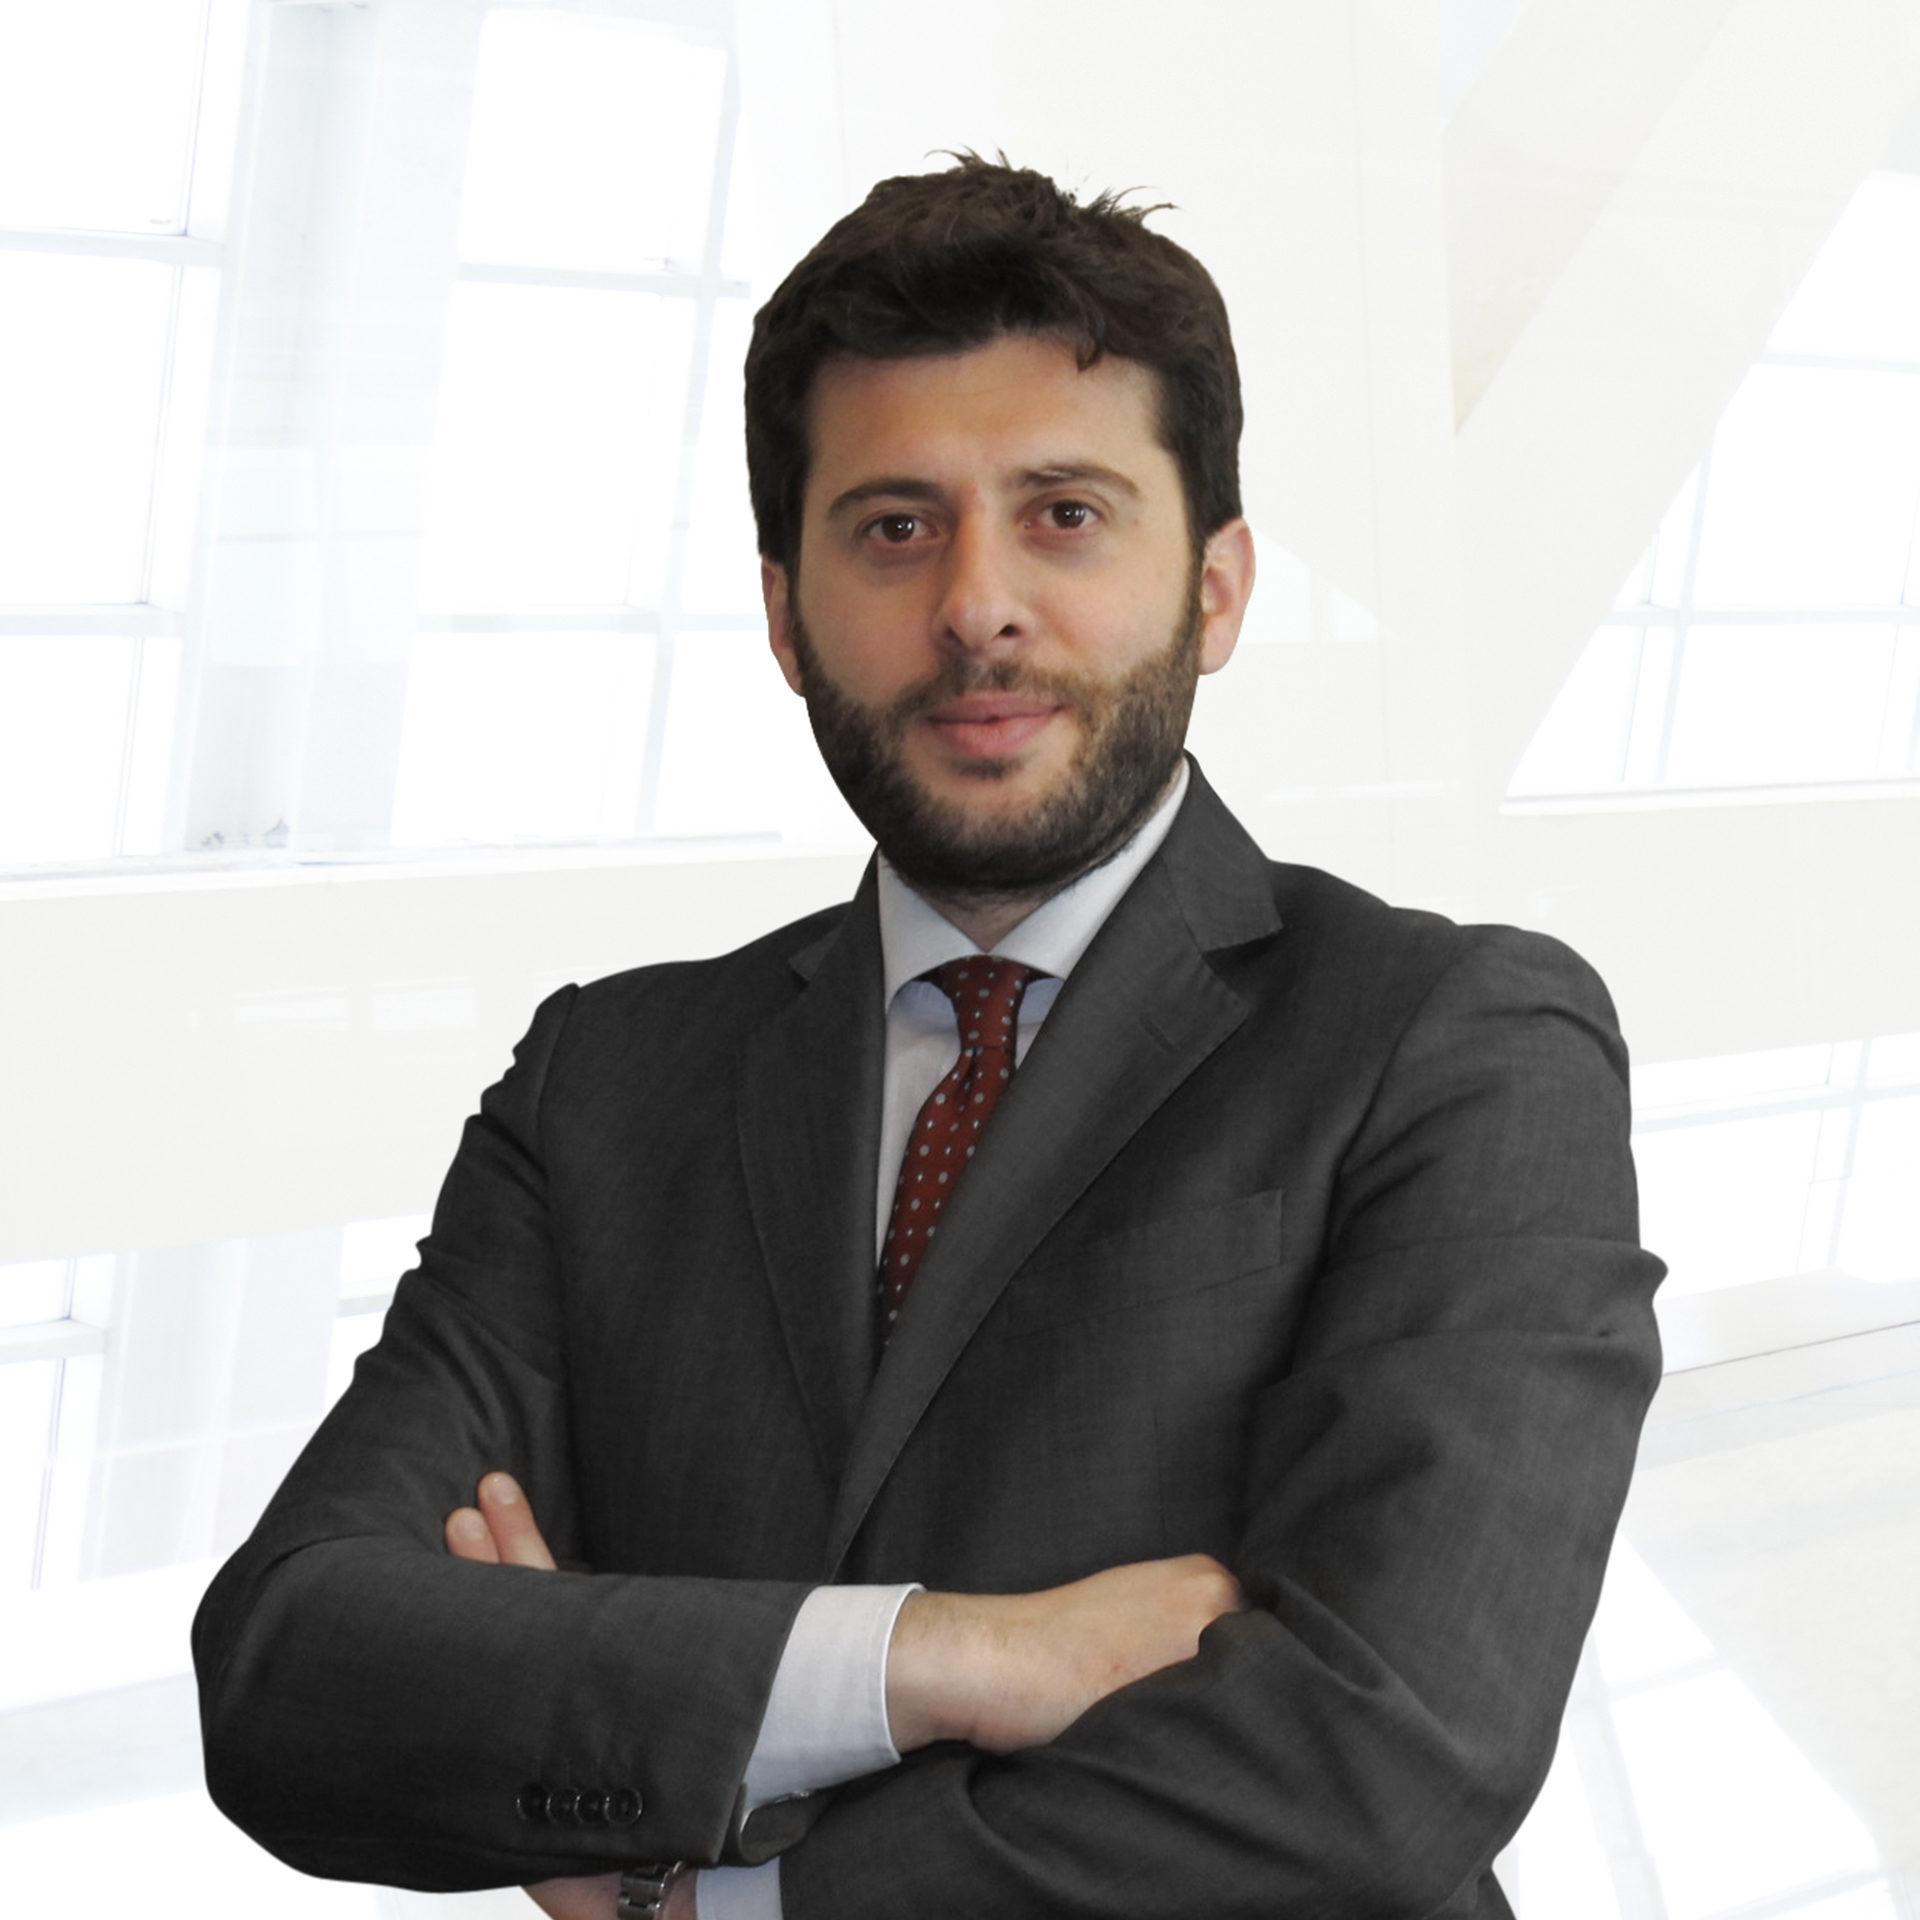 Photo of Adriano Adriani